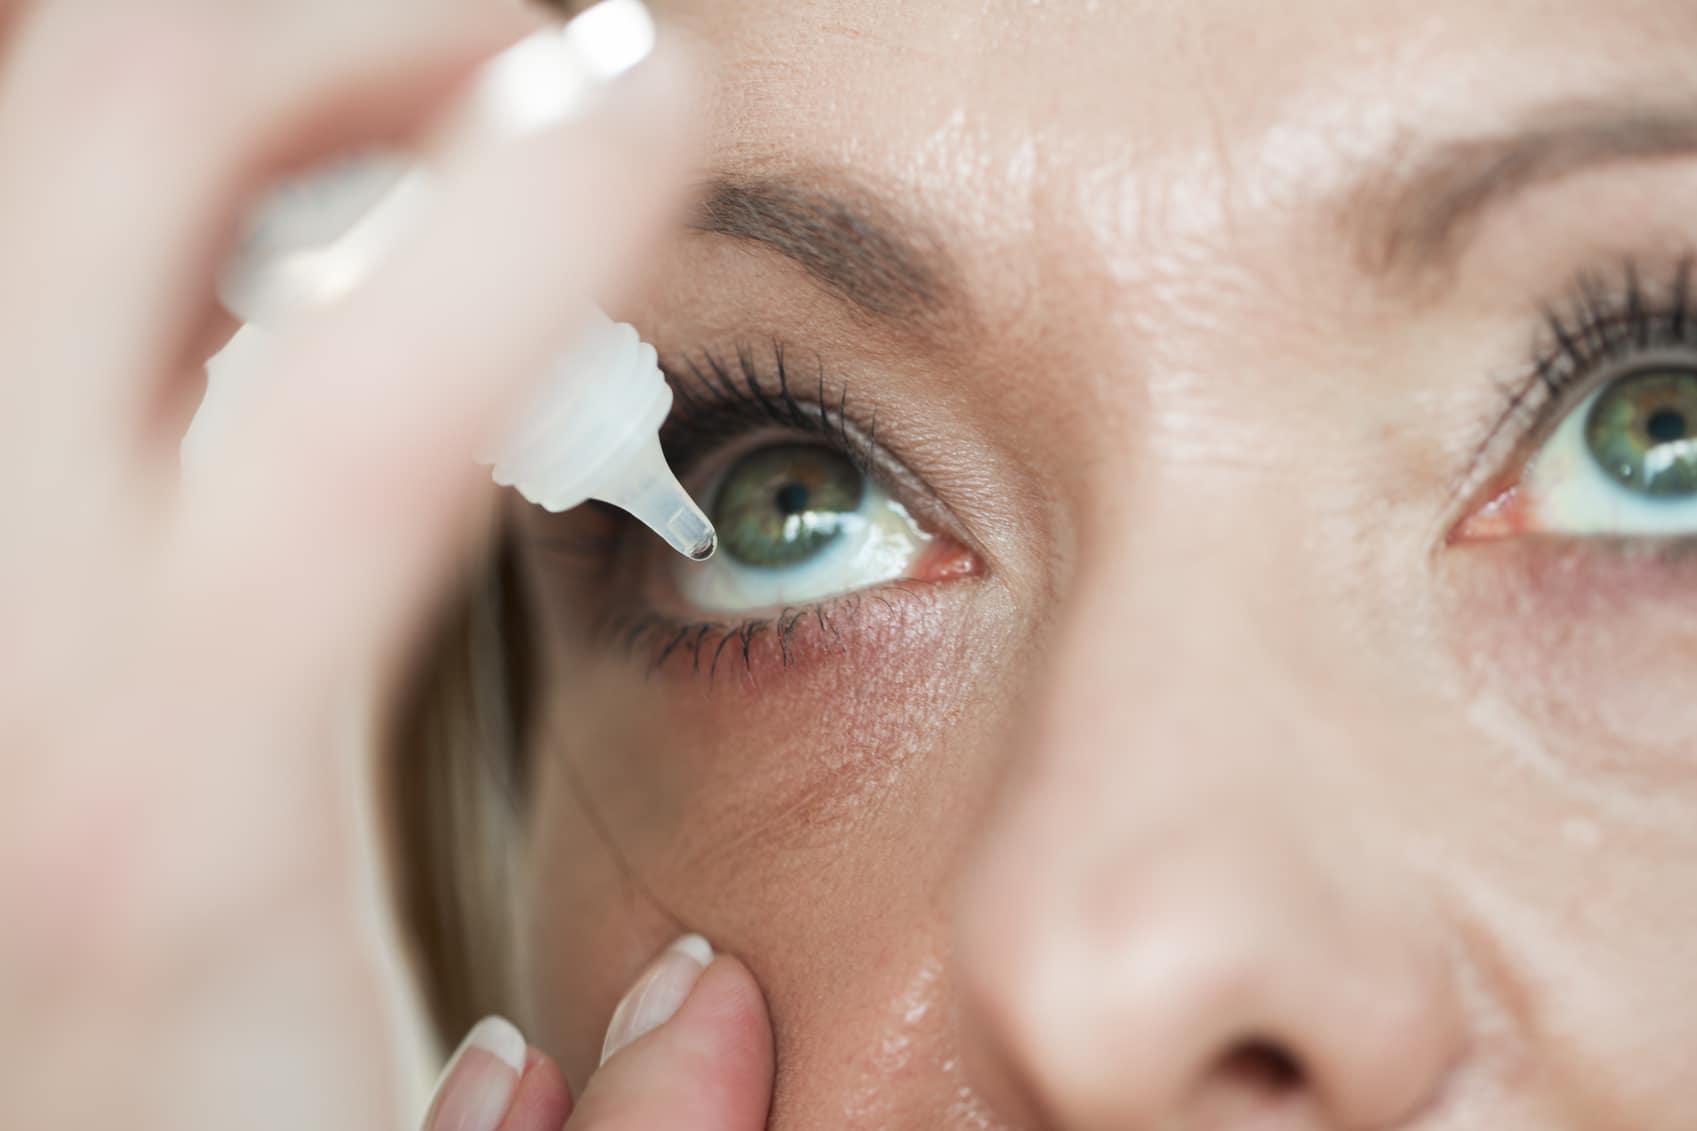 Woman usind eyedropper...applying eye drops